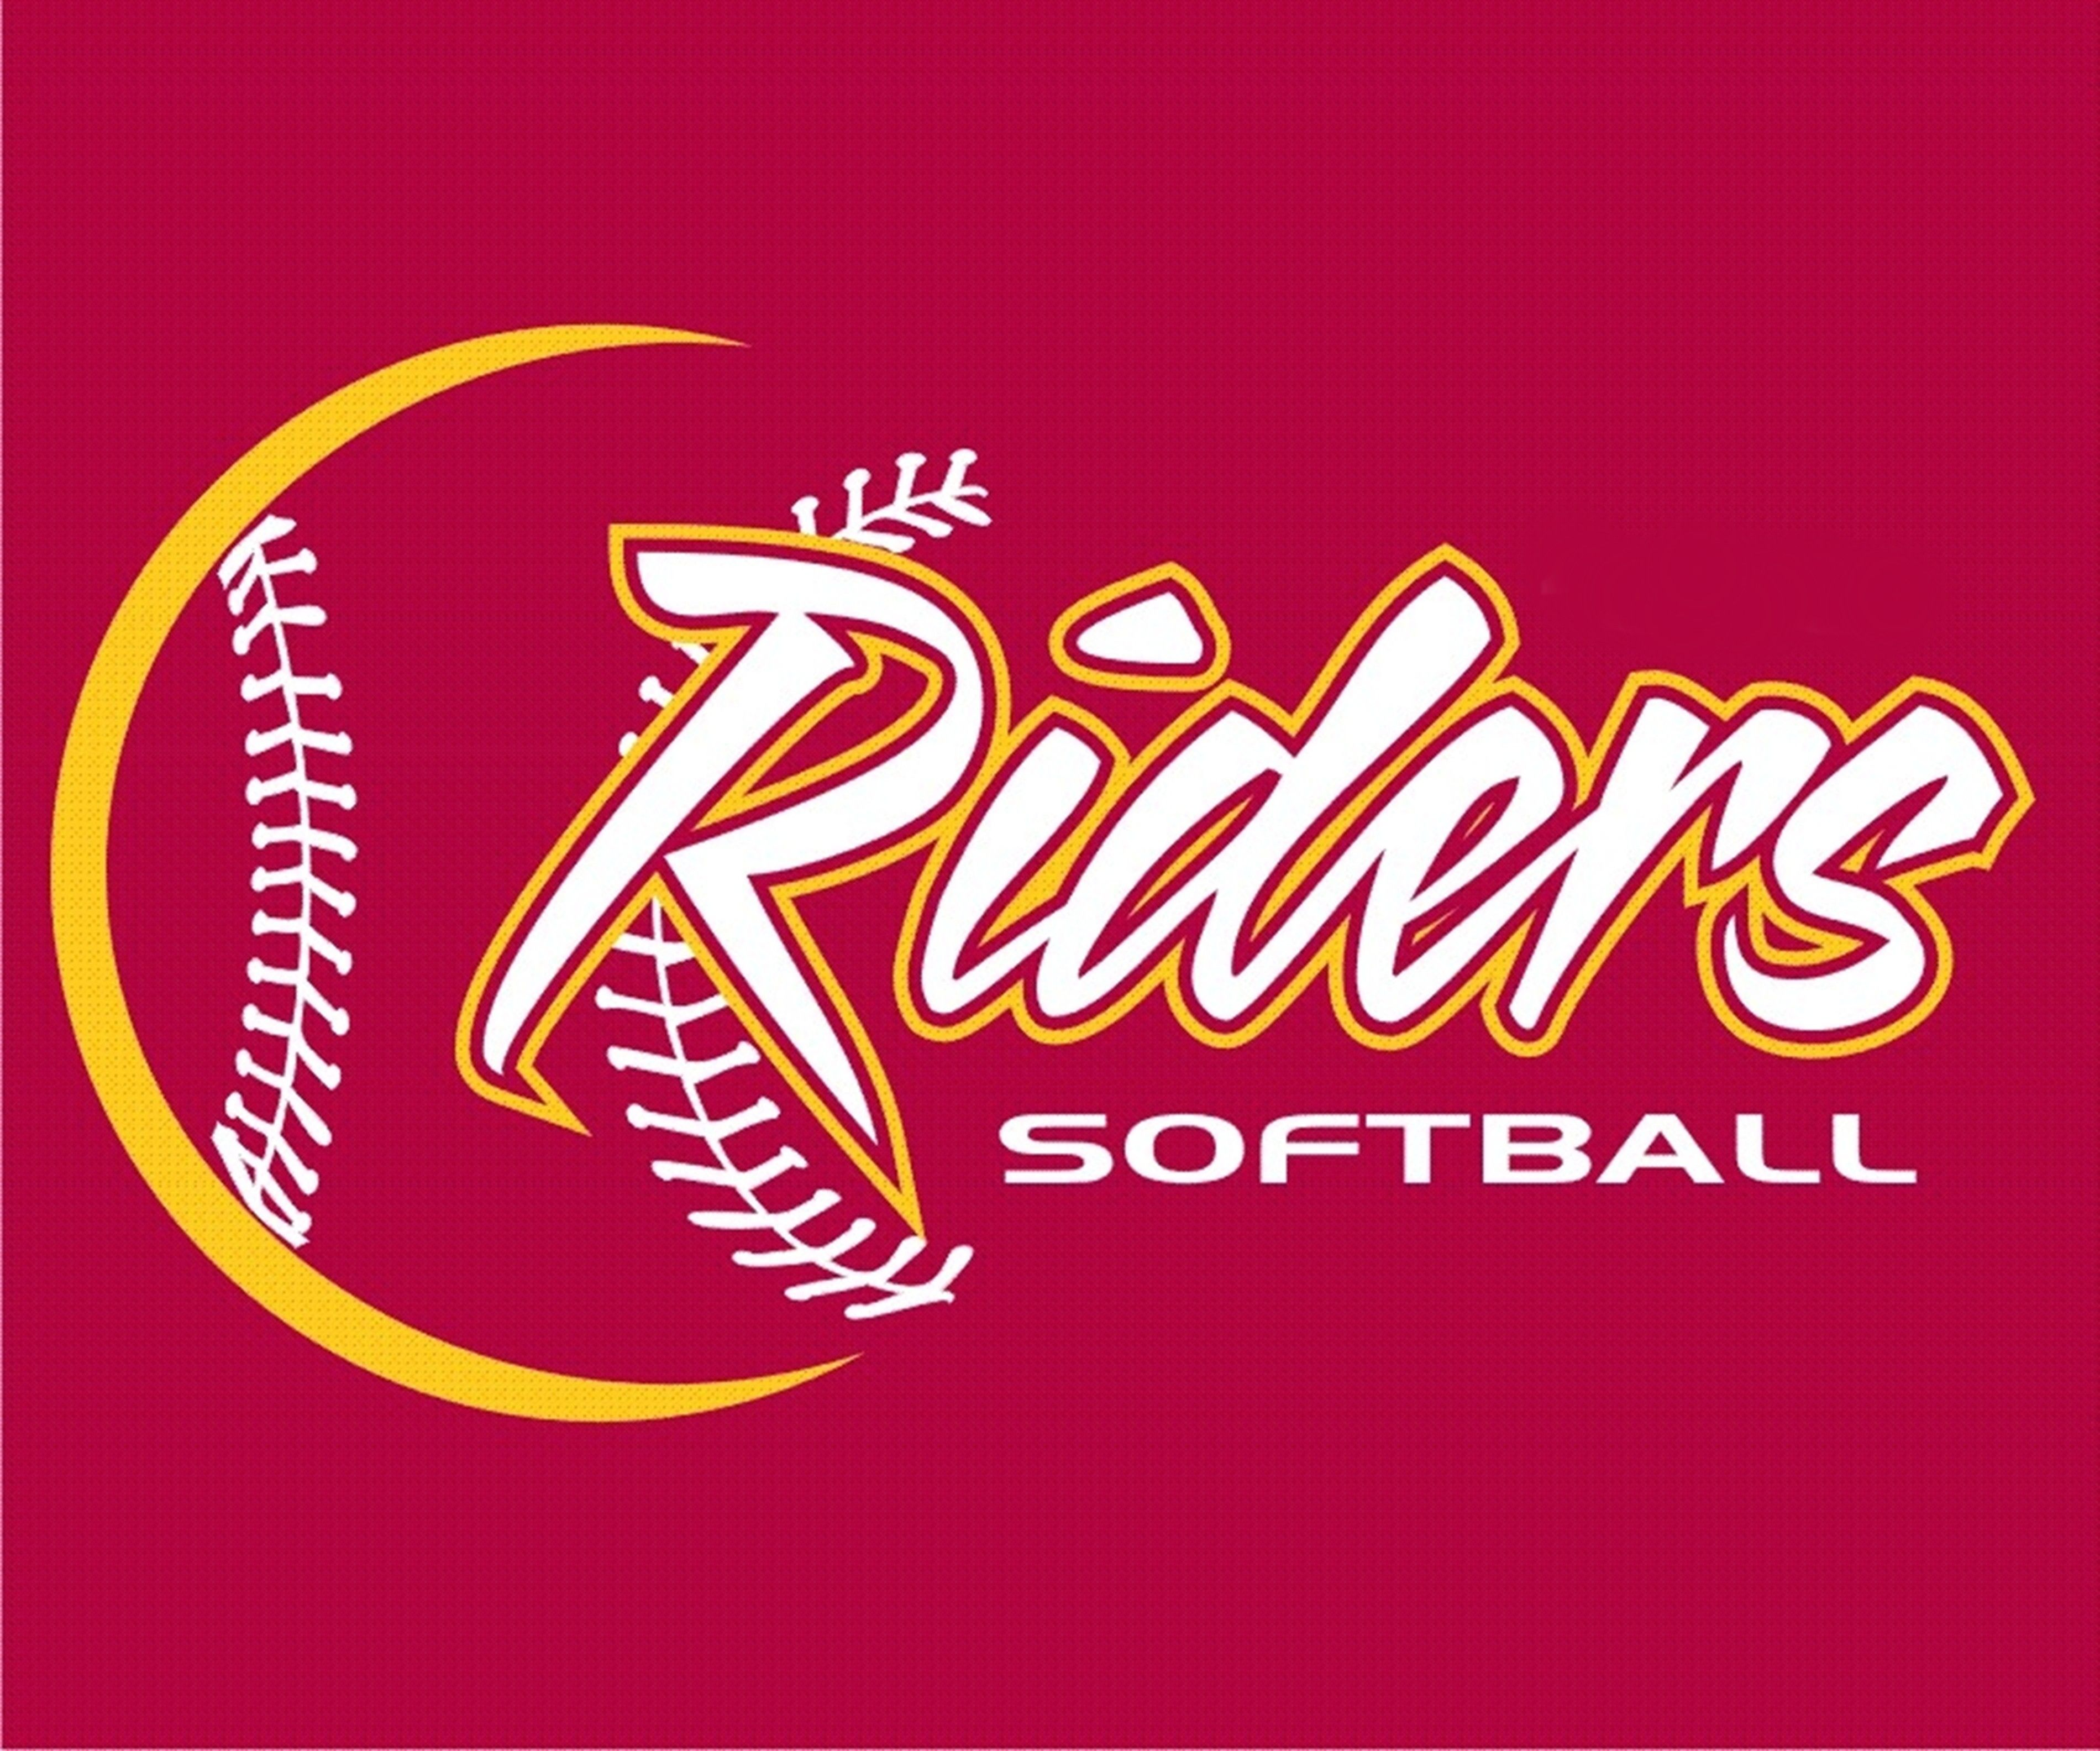 High School Softball Team Logos Yahoo Image Search